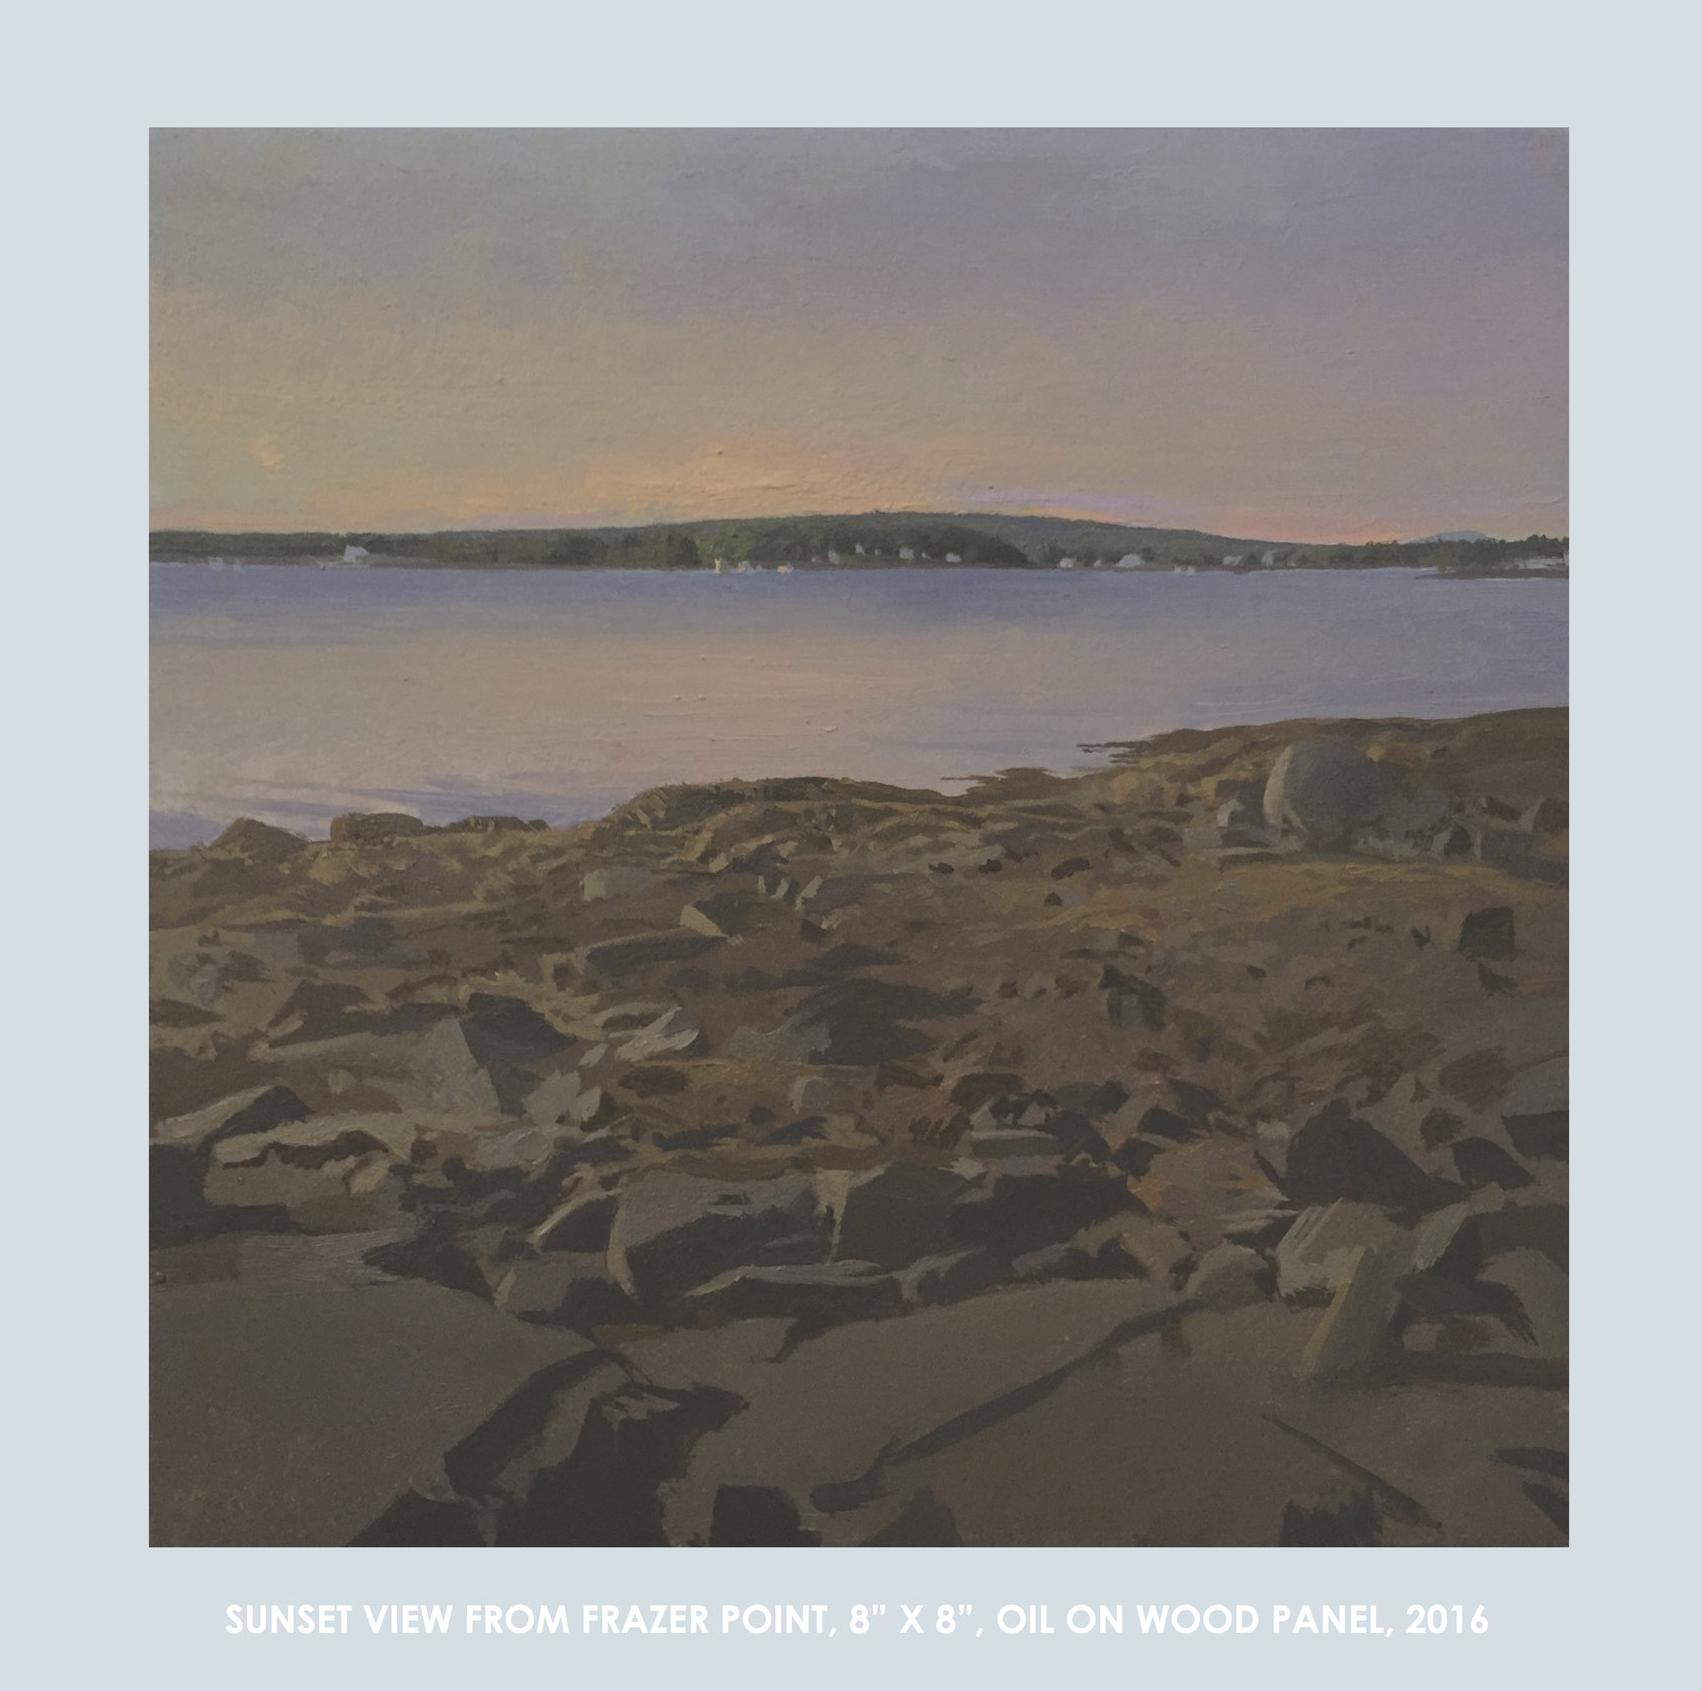 2016 Summer Winter Harbor Collection-Christopher Tietjen-FOR WEB-6.jpg